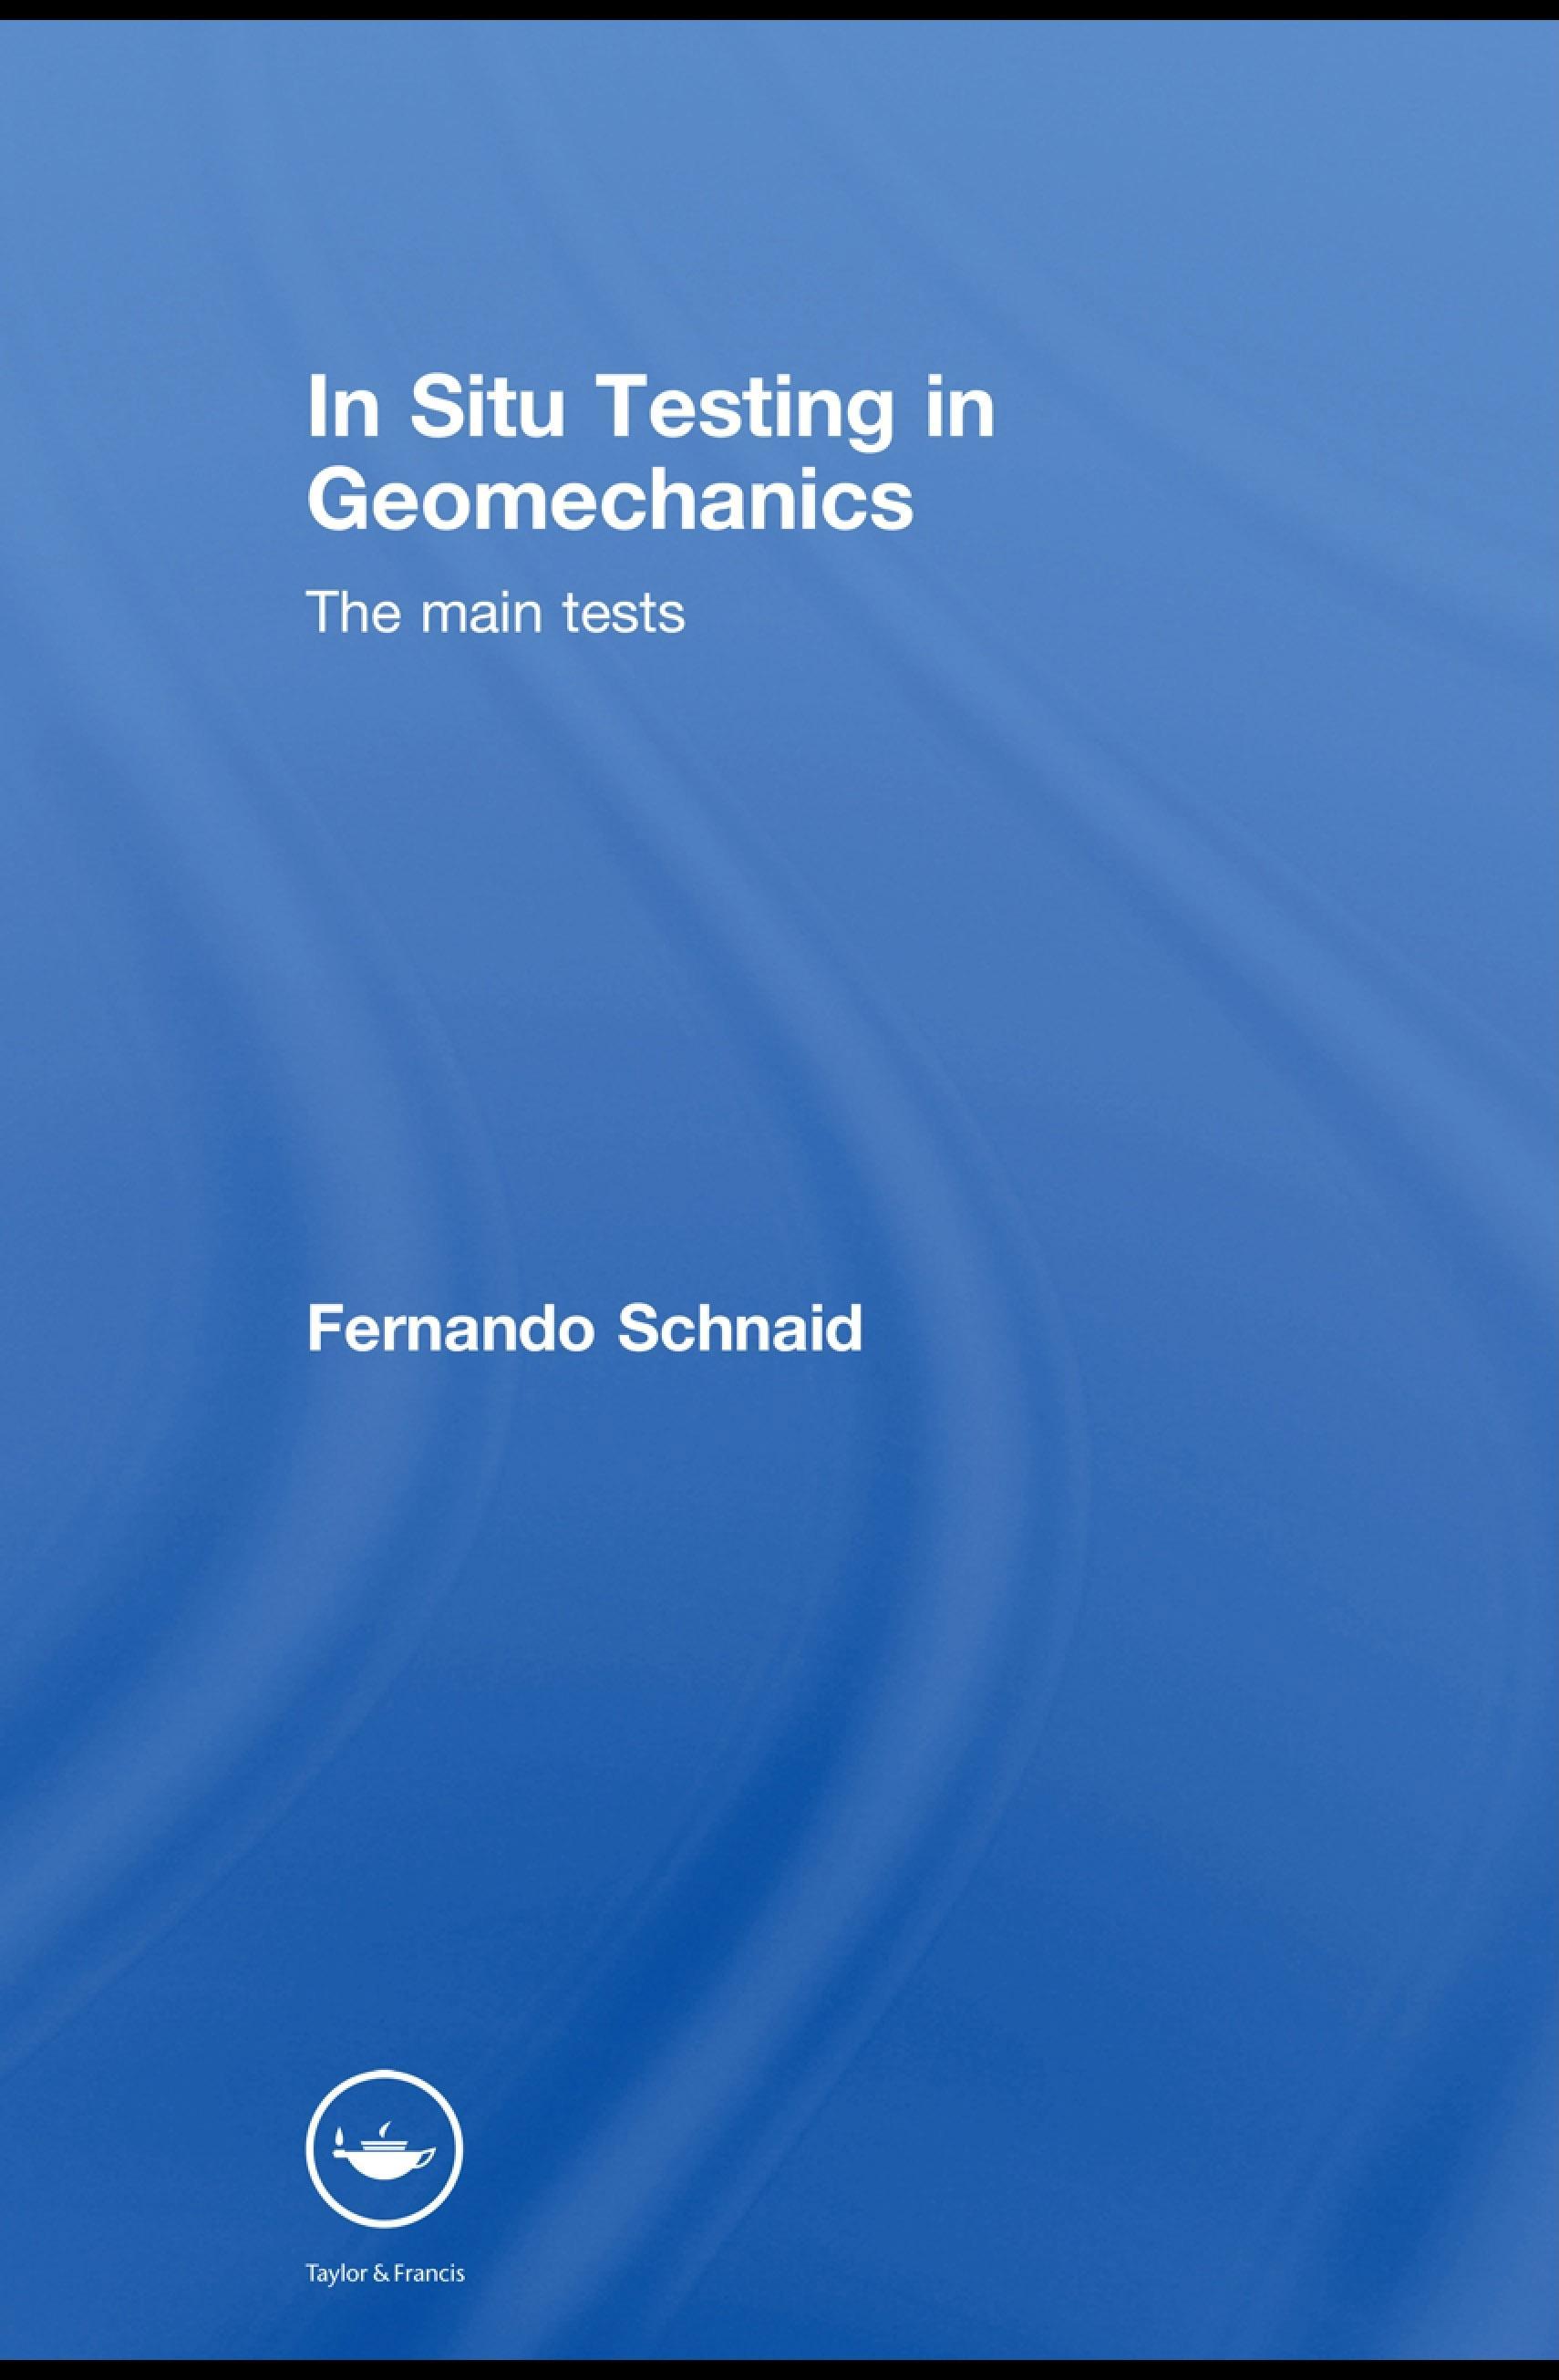 In Situ Testing in Geomechanics: The Main Tests EB9780203931332